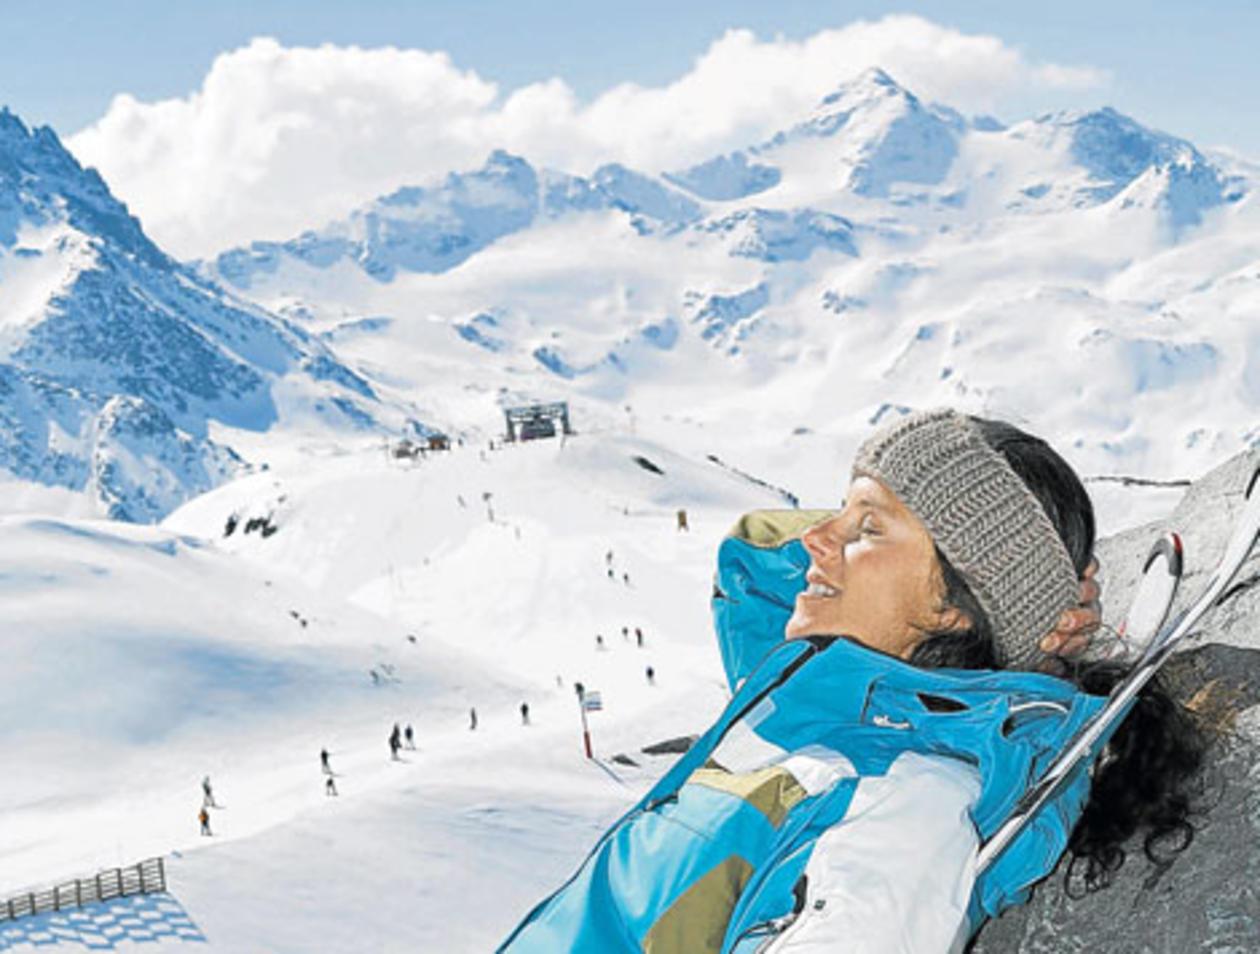 Wo Es In Den Skigebieten Etwas Gratis Gibt Outdoor